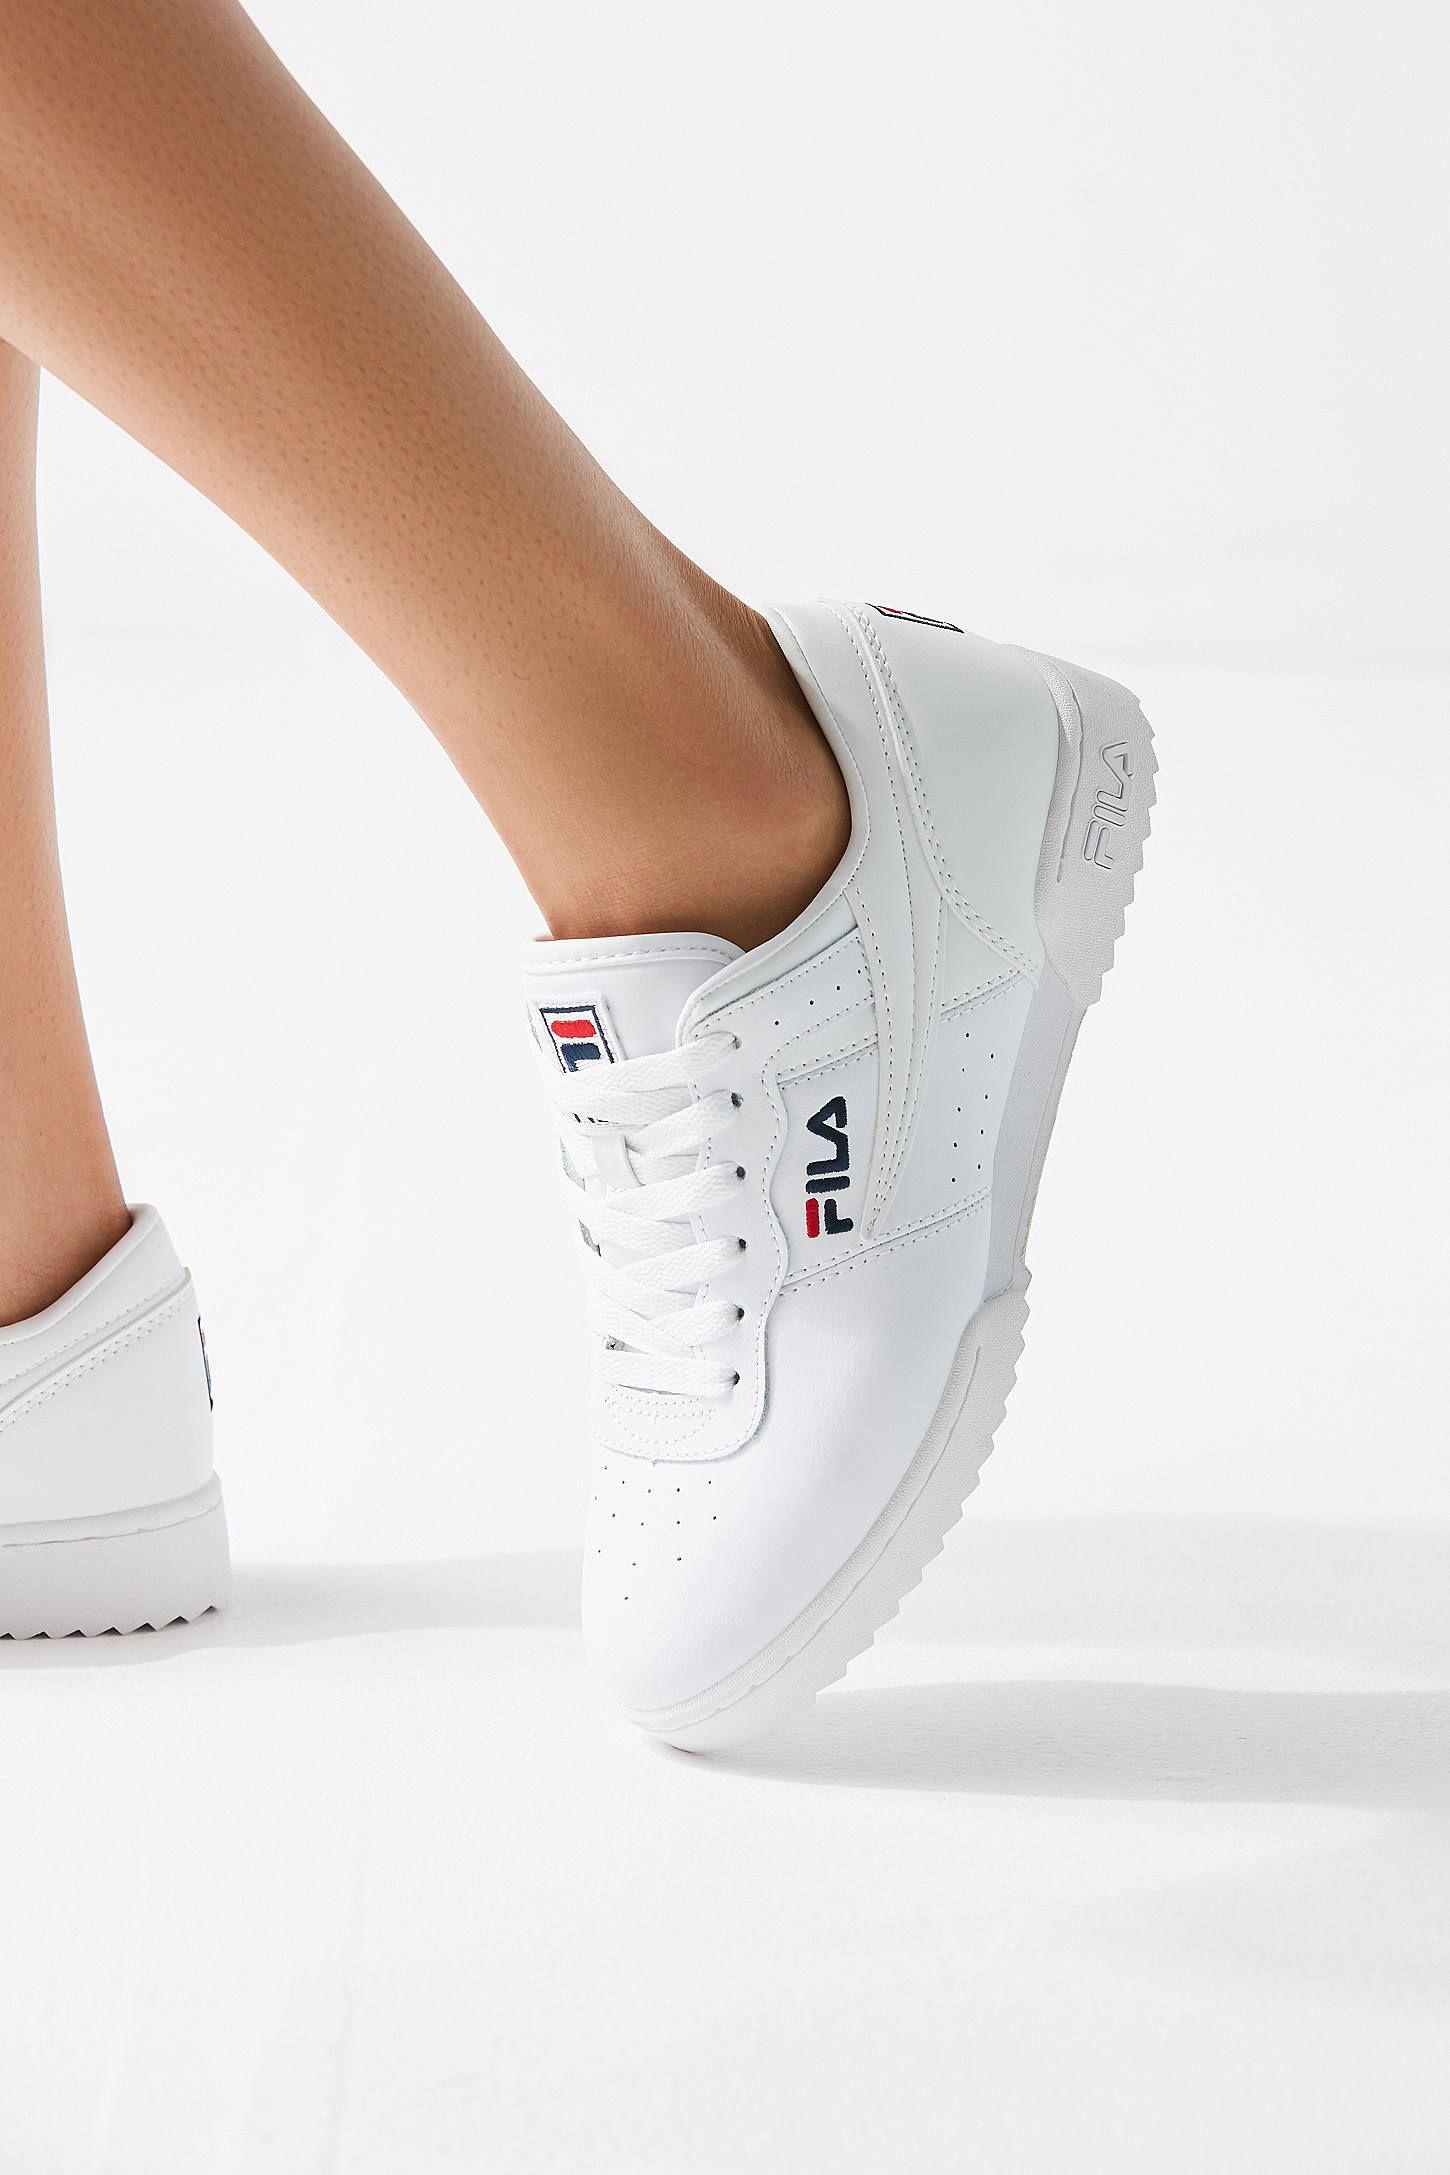 FILA Original Fitness Ripple Sneaker  7cbe32af7f5